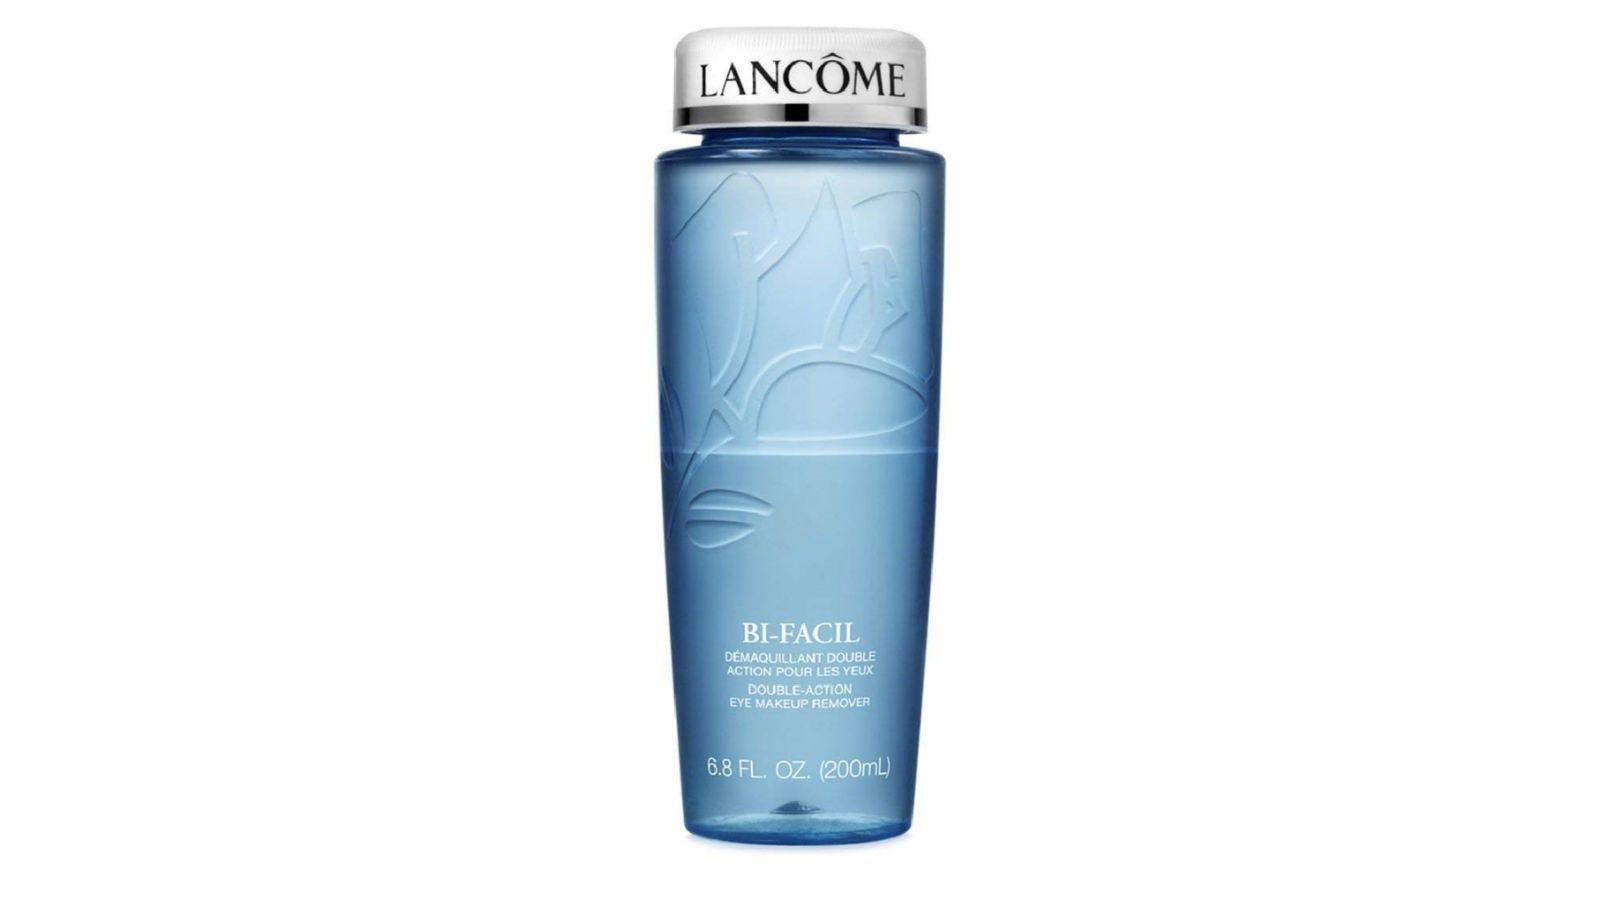 lancome bi-facil double action eye makeup remover